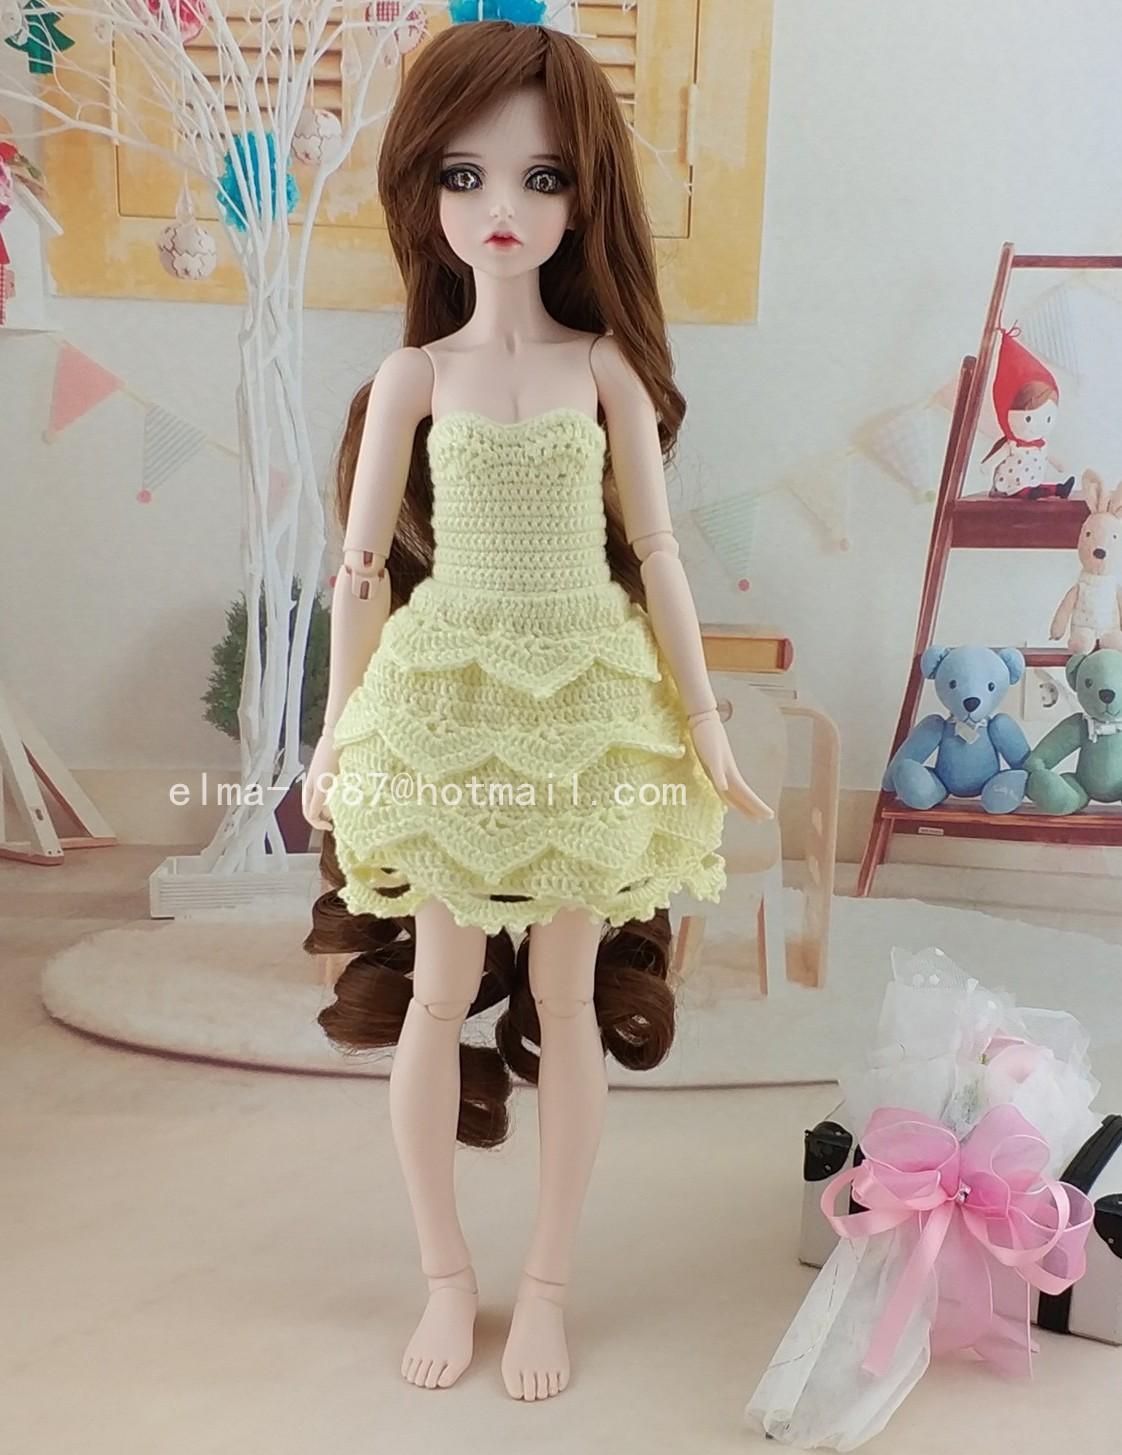 crochet-pink-dress_1.jpg